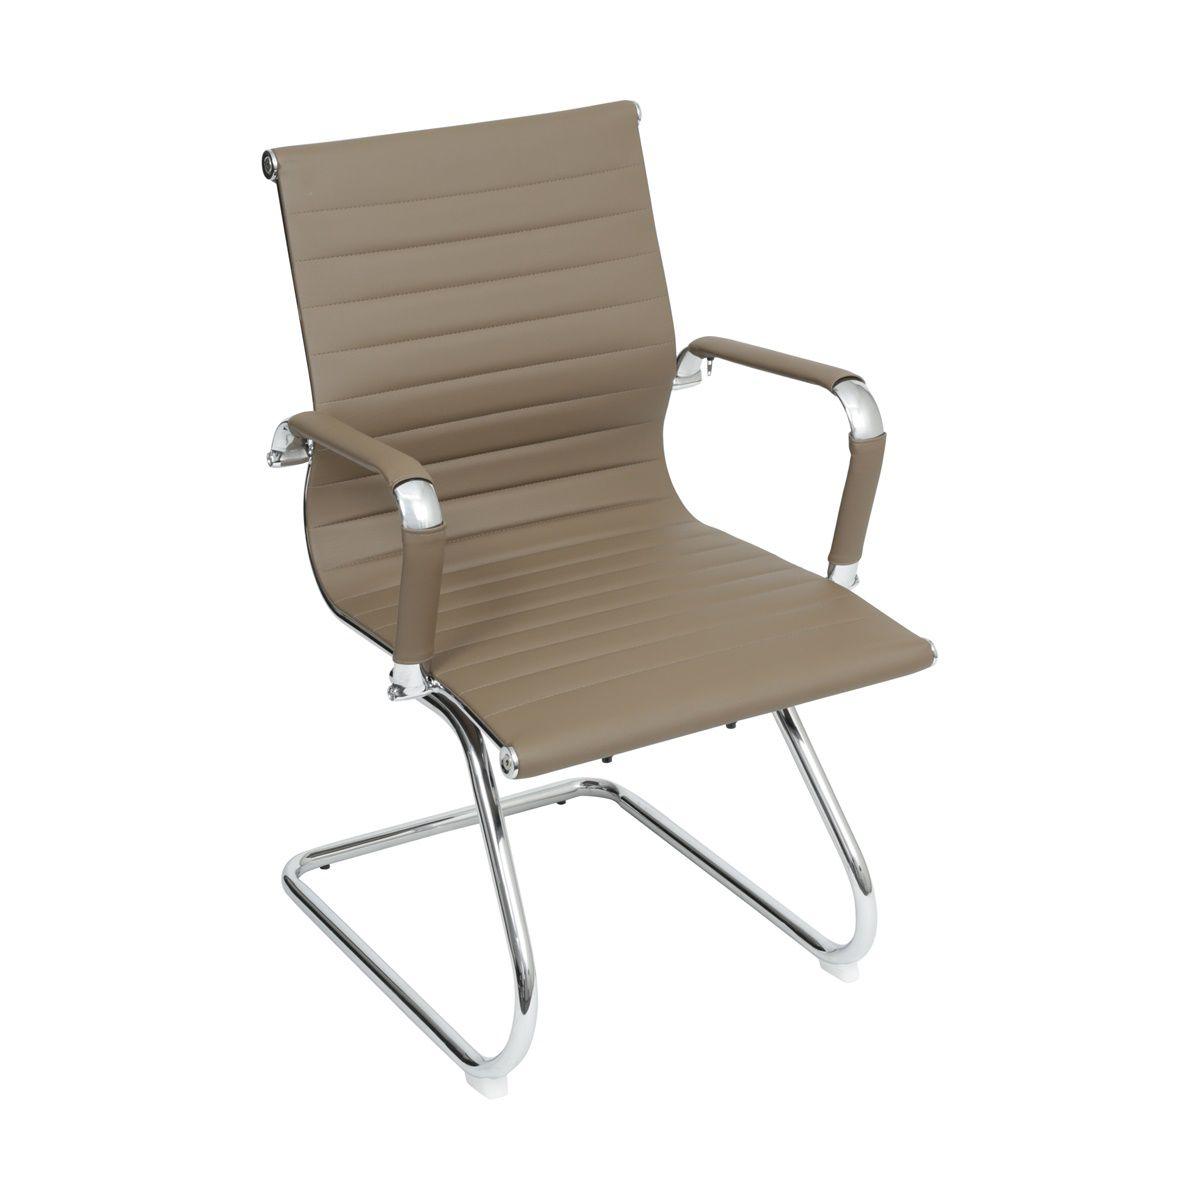 Cadeira Charles Eames Office Esteirinha Corino Fixa Interlocutor